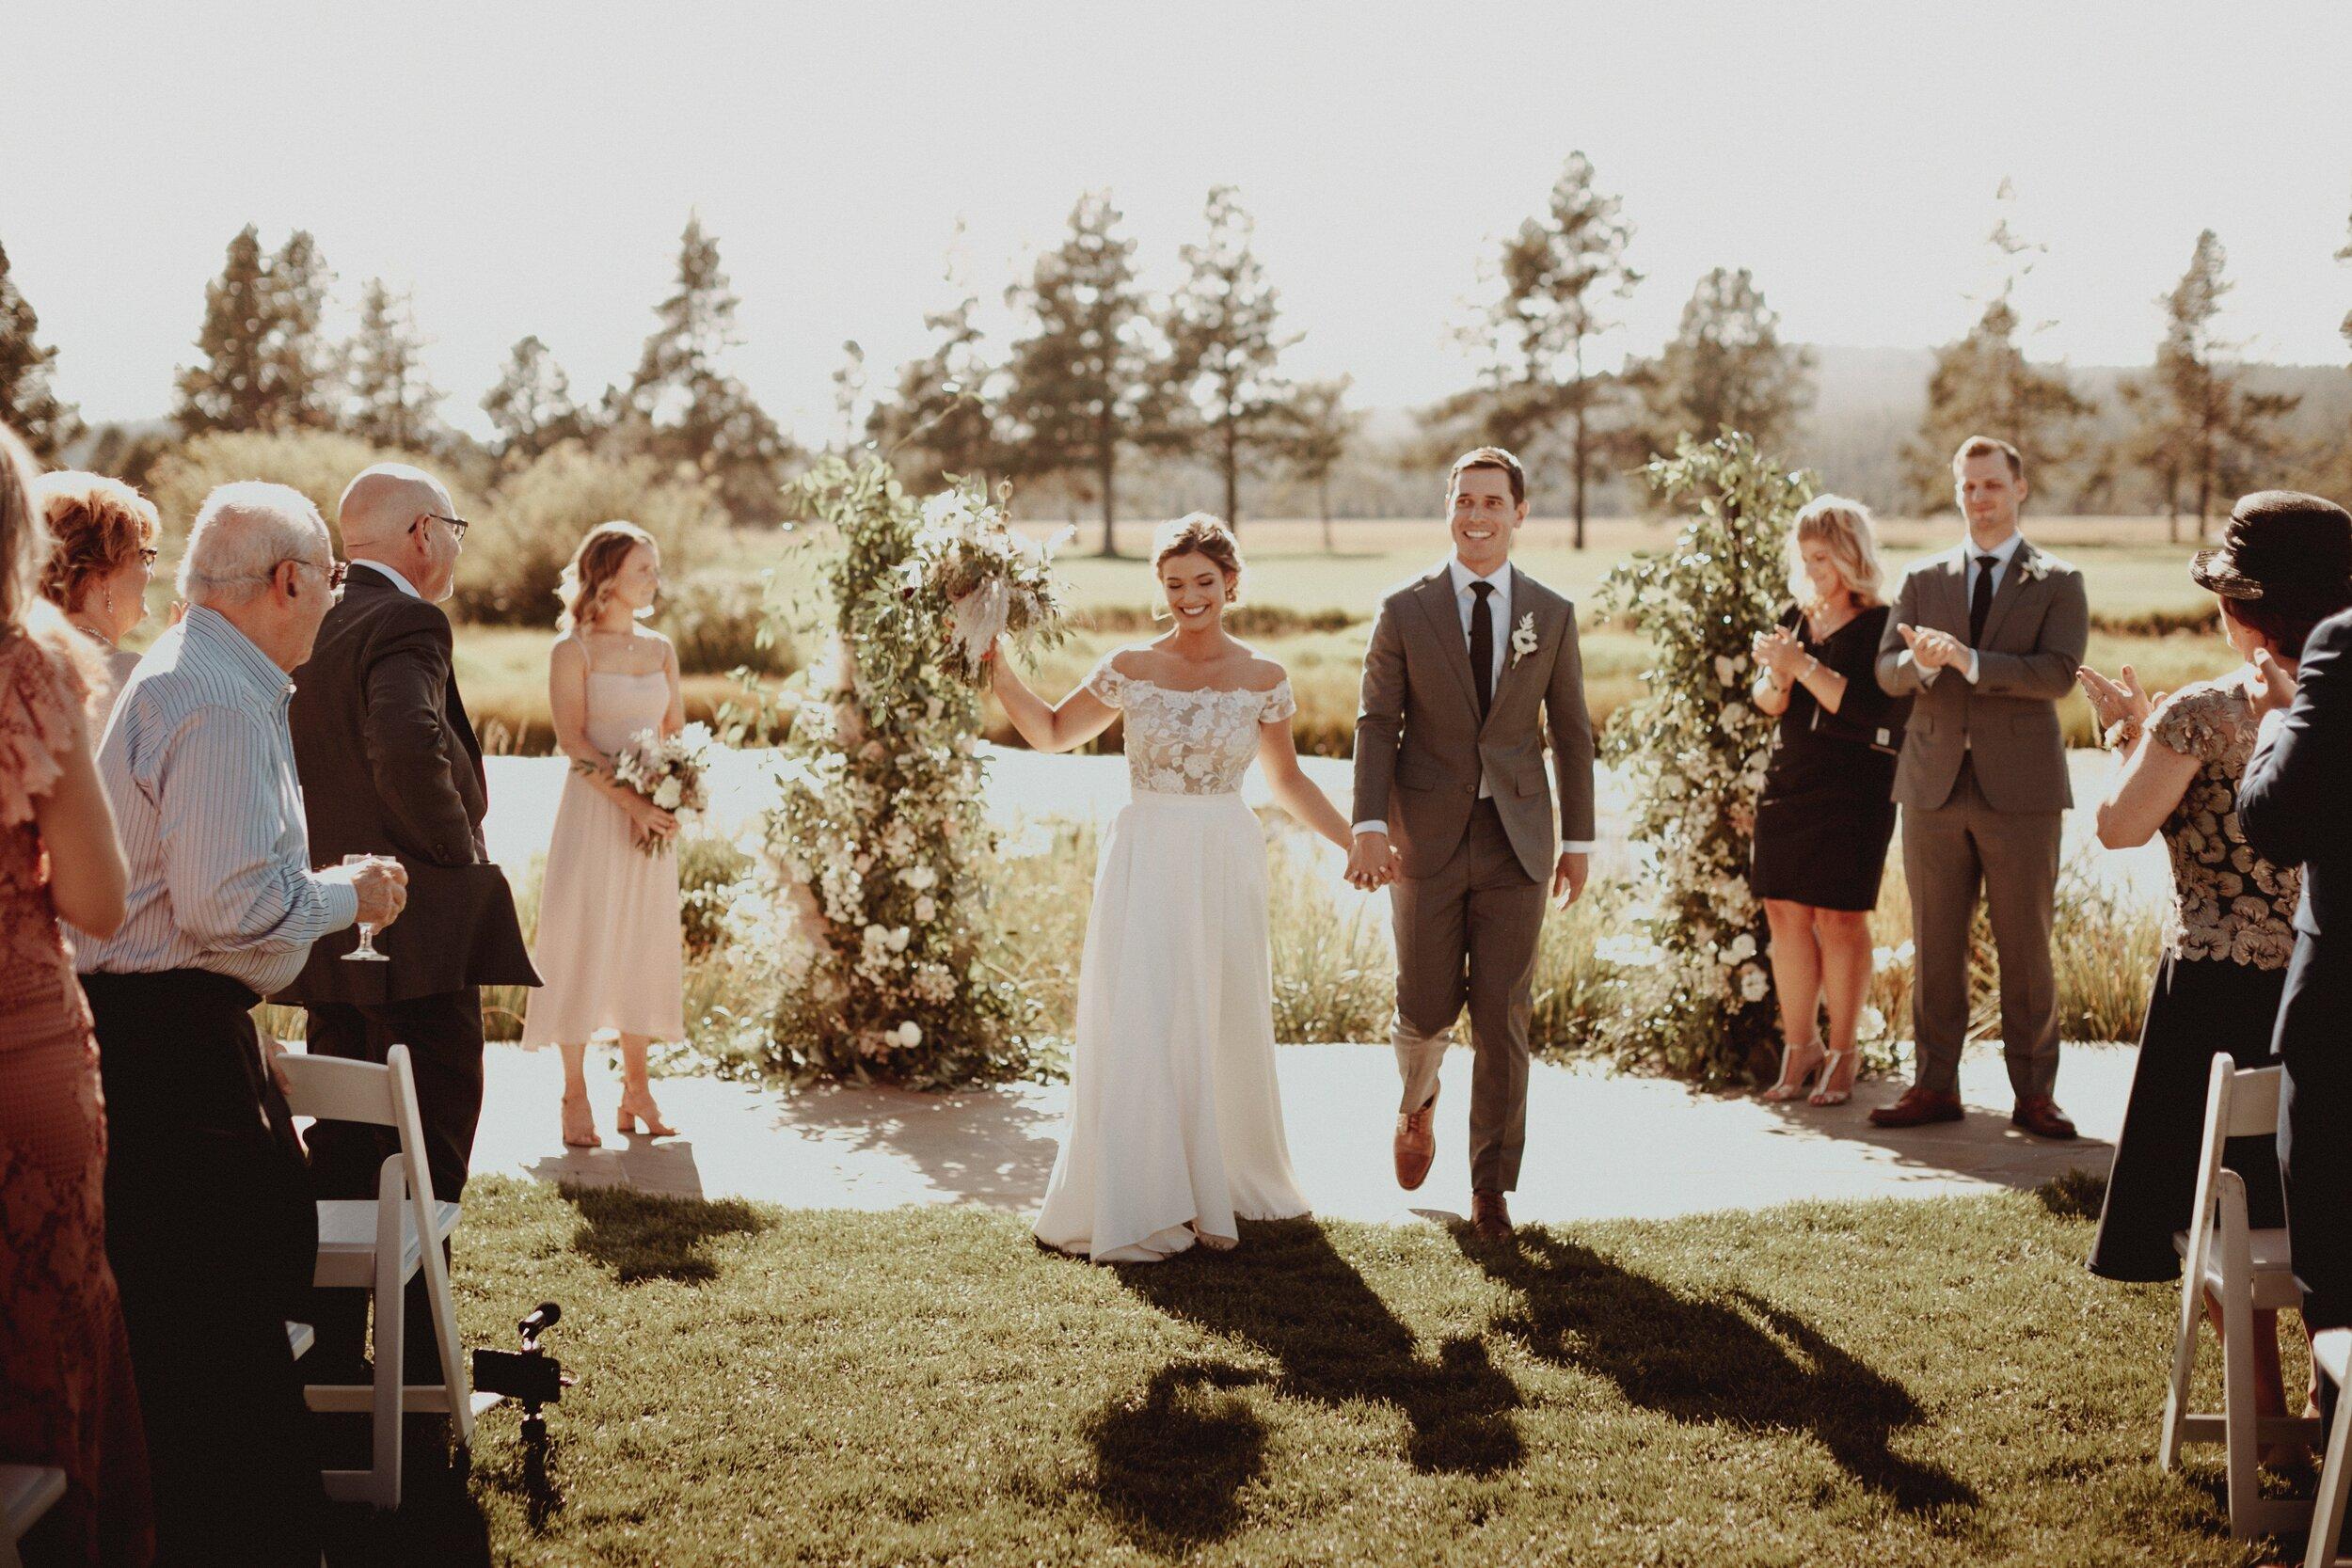 J and M Wed in Sunriver.Lauren Apel Photo514.jpg